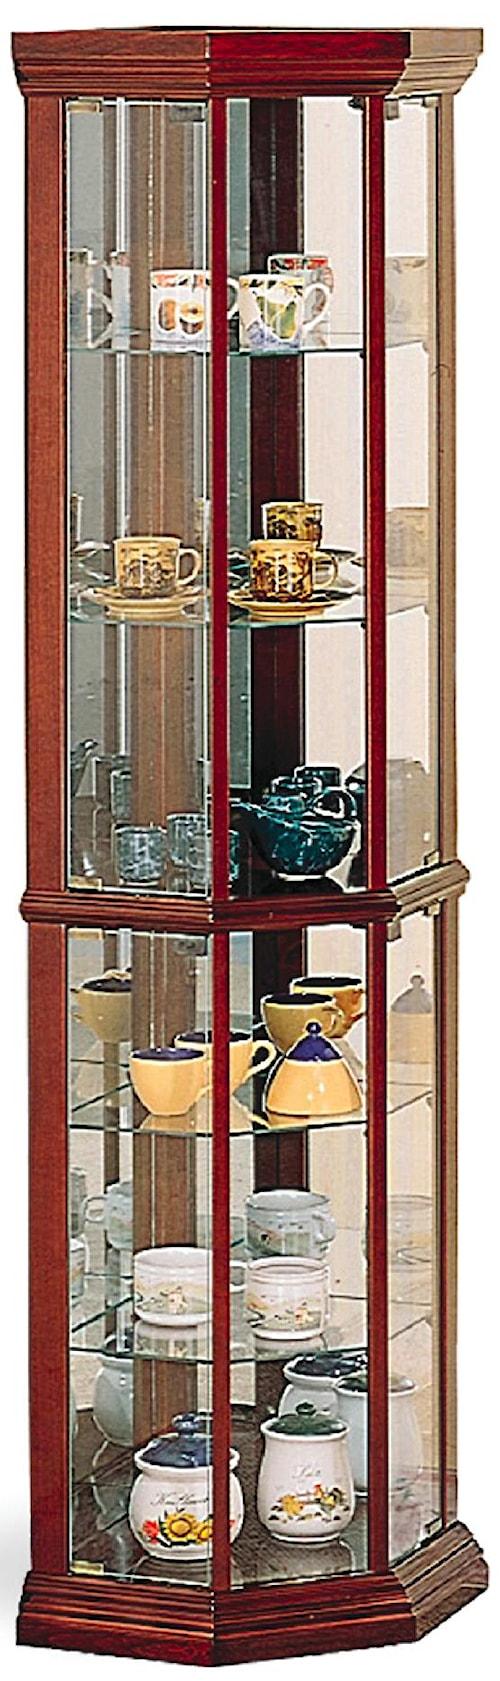 Coaster Curio Cabinets Solid Wood Cherry Gl Corner Cabinet